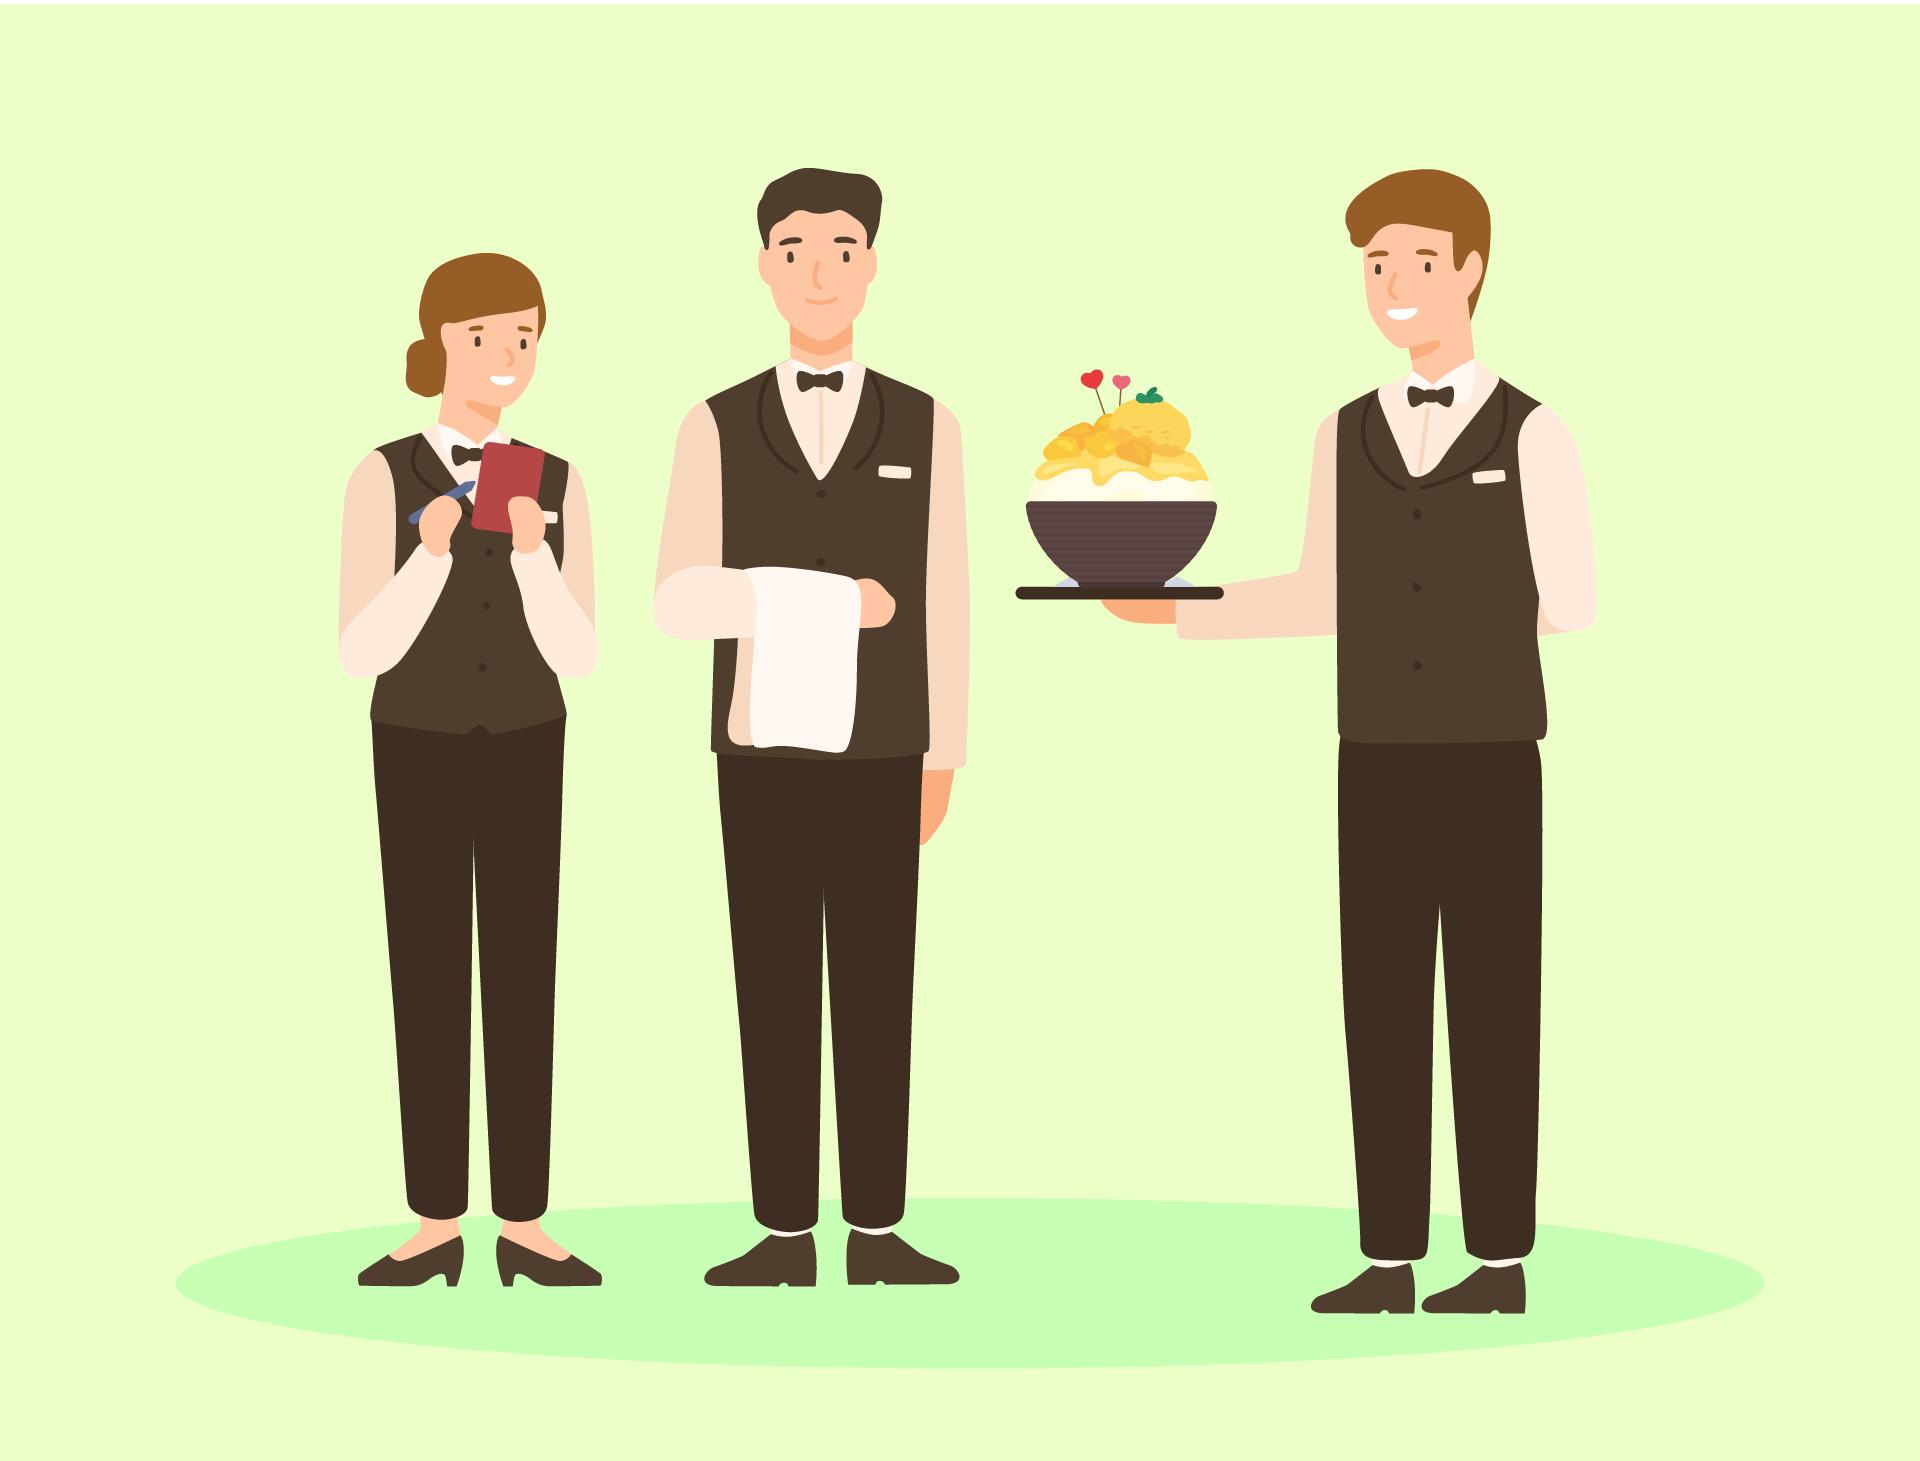 Gambaran seorang pekerja hotel wanita yang memegang bil, seorang pekerja hotel lelaki yang memegang kain meja, dan seorang lagi pekerja hotel lelaki memegang Bingsu Mangga